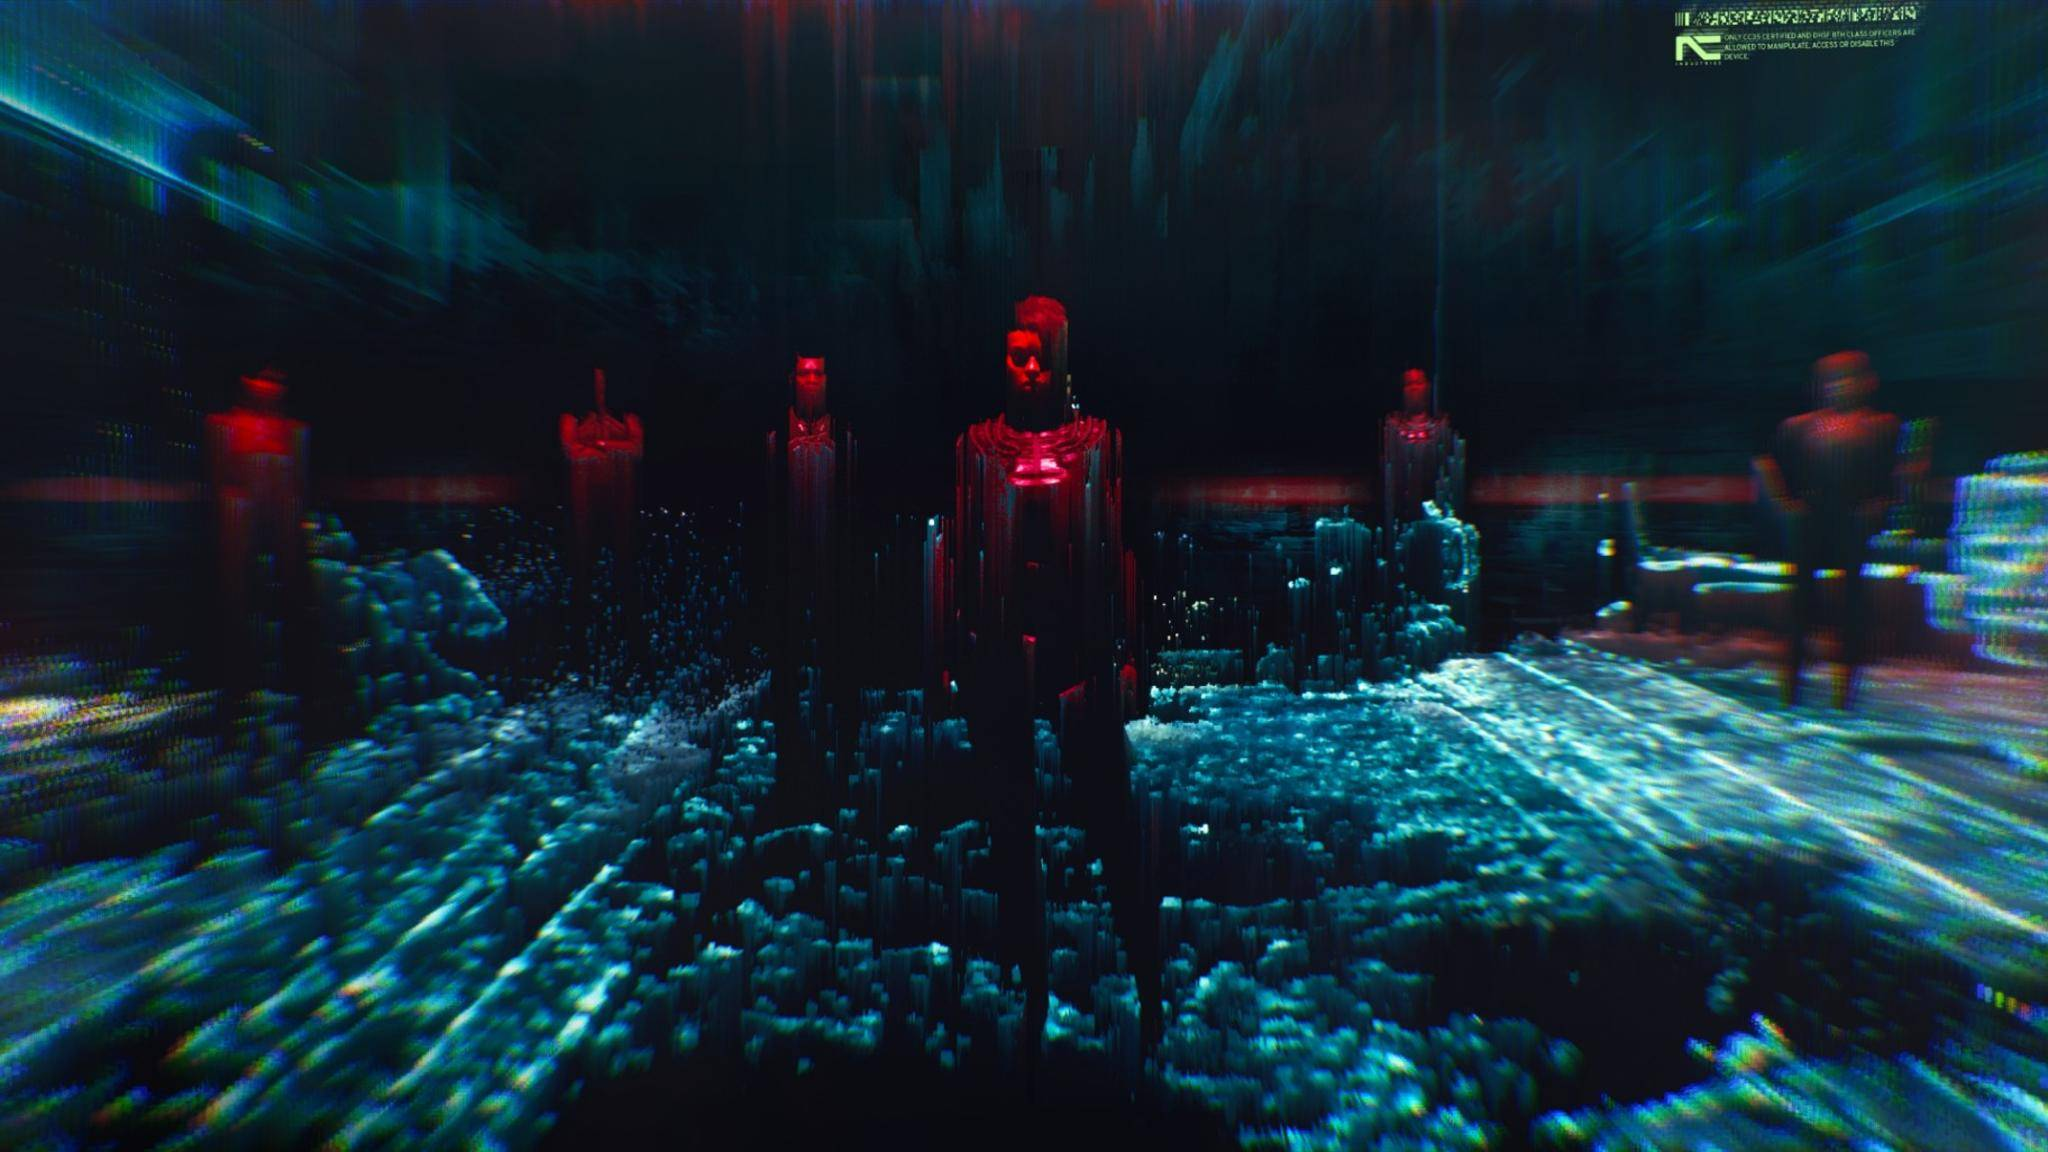 cyberpunk-2077-e3-2019-screenshot-07